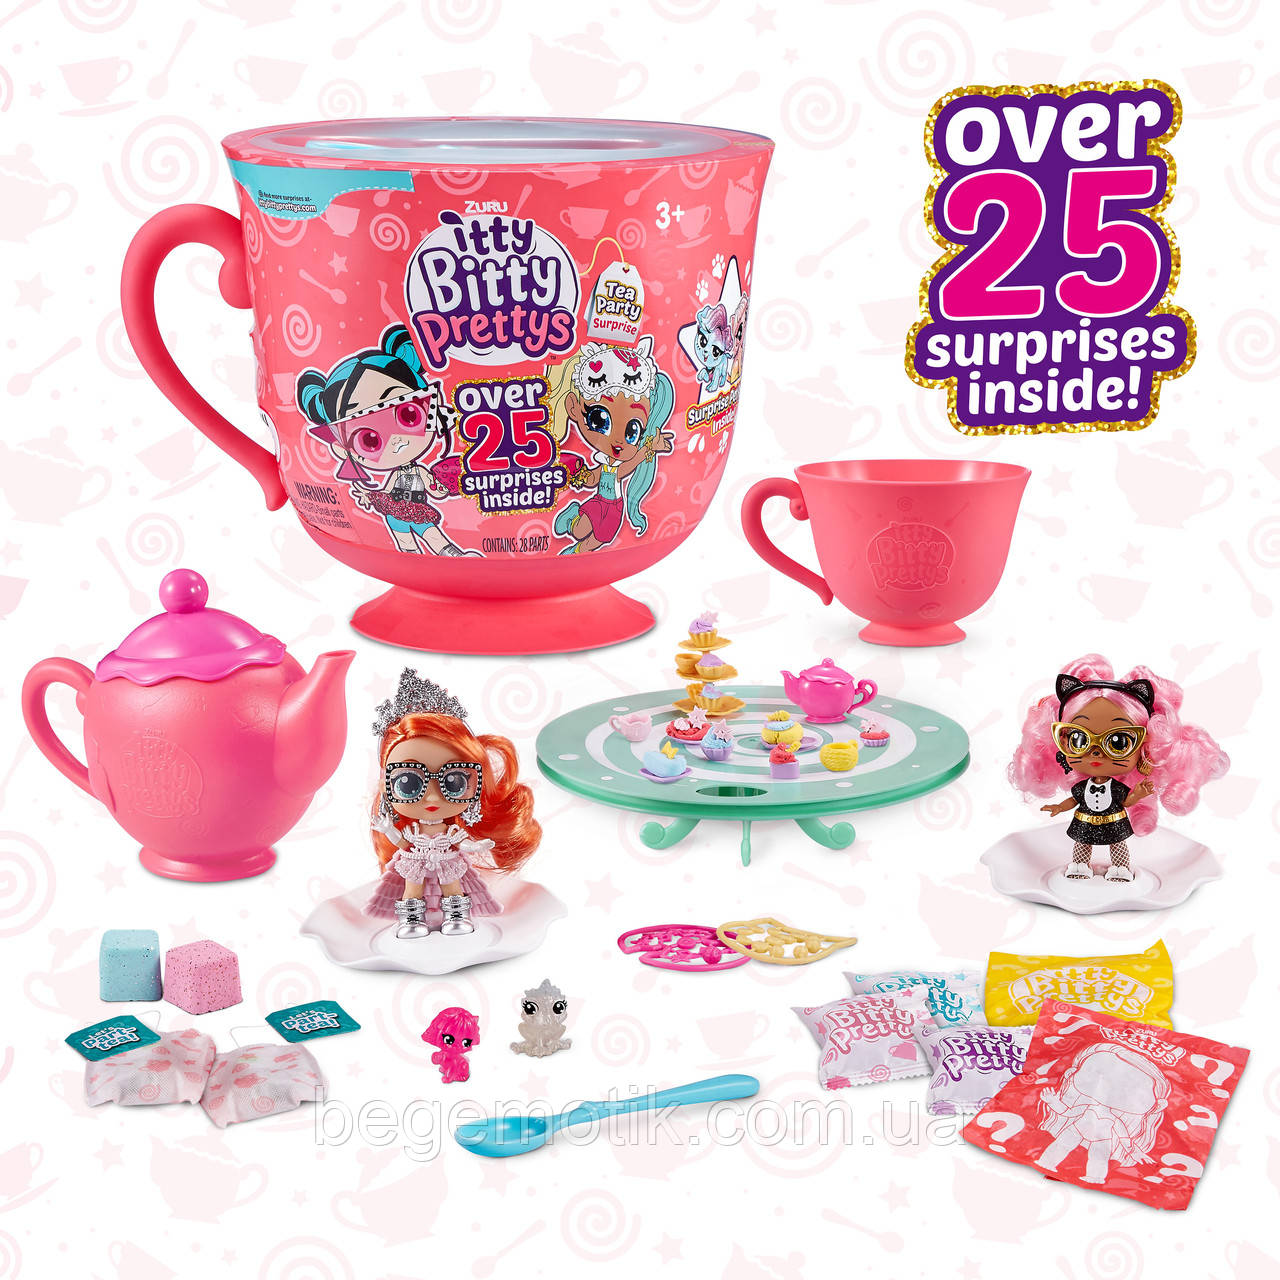 Игровой набор -сюрприз Чаепитие Итти Битти tty Bitty Prettys Tea Party Teacup Dolls Playset 9703A